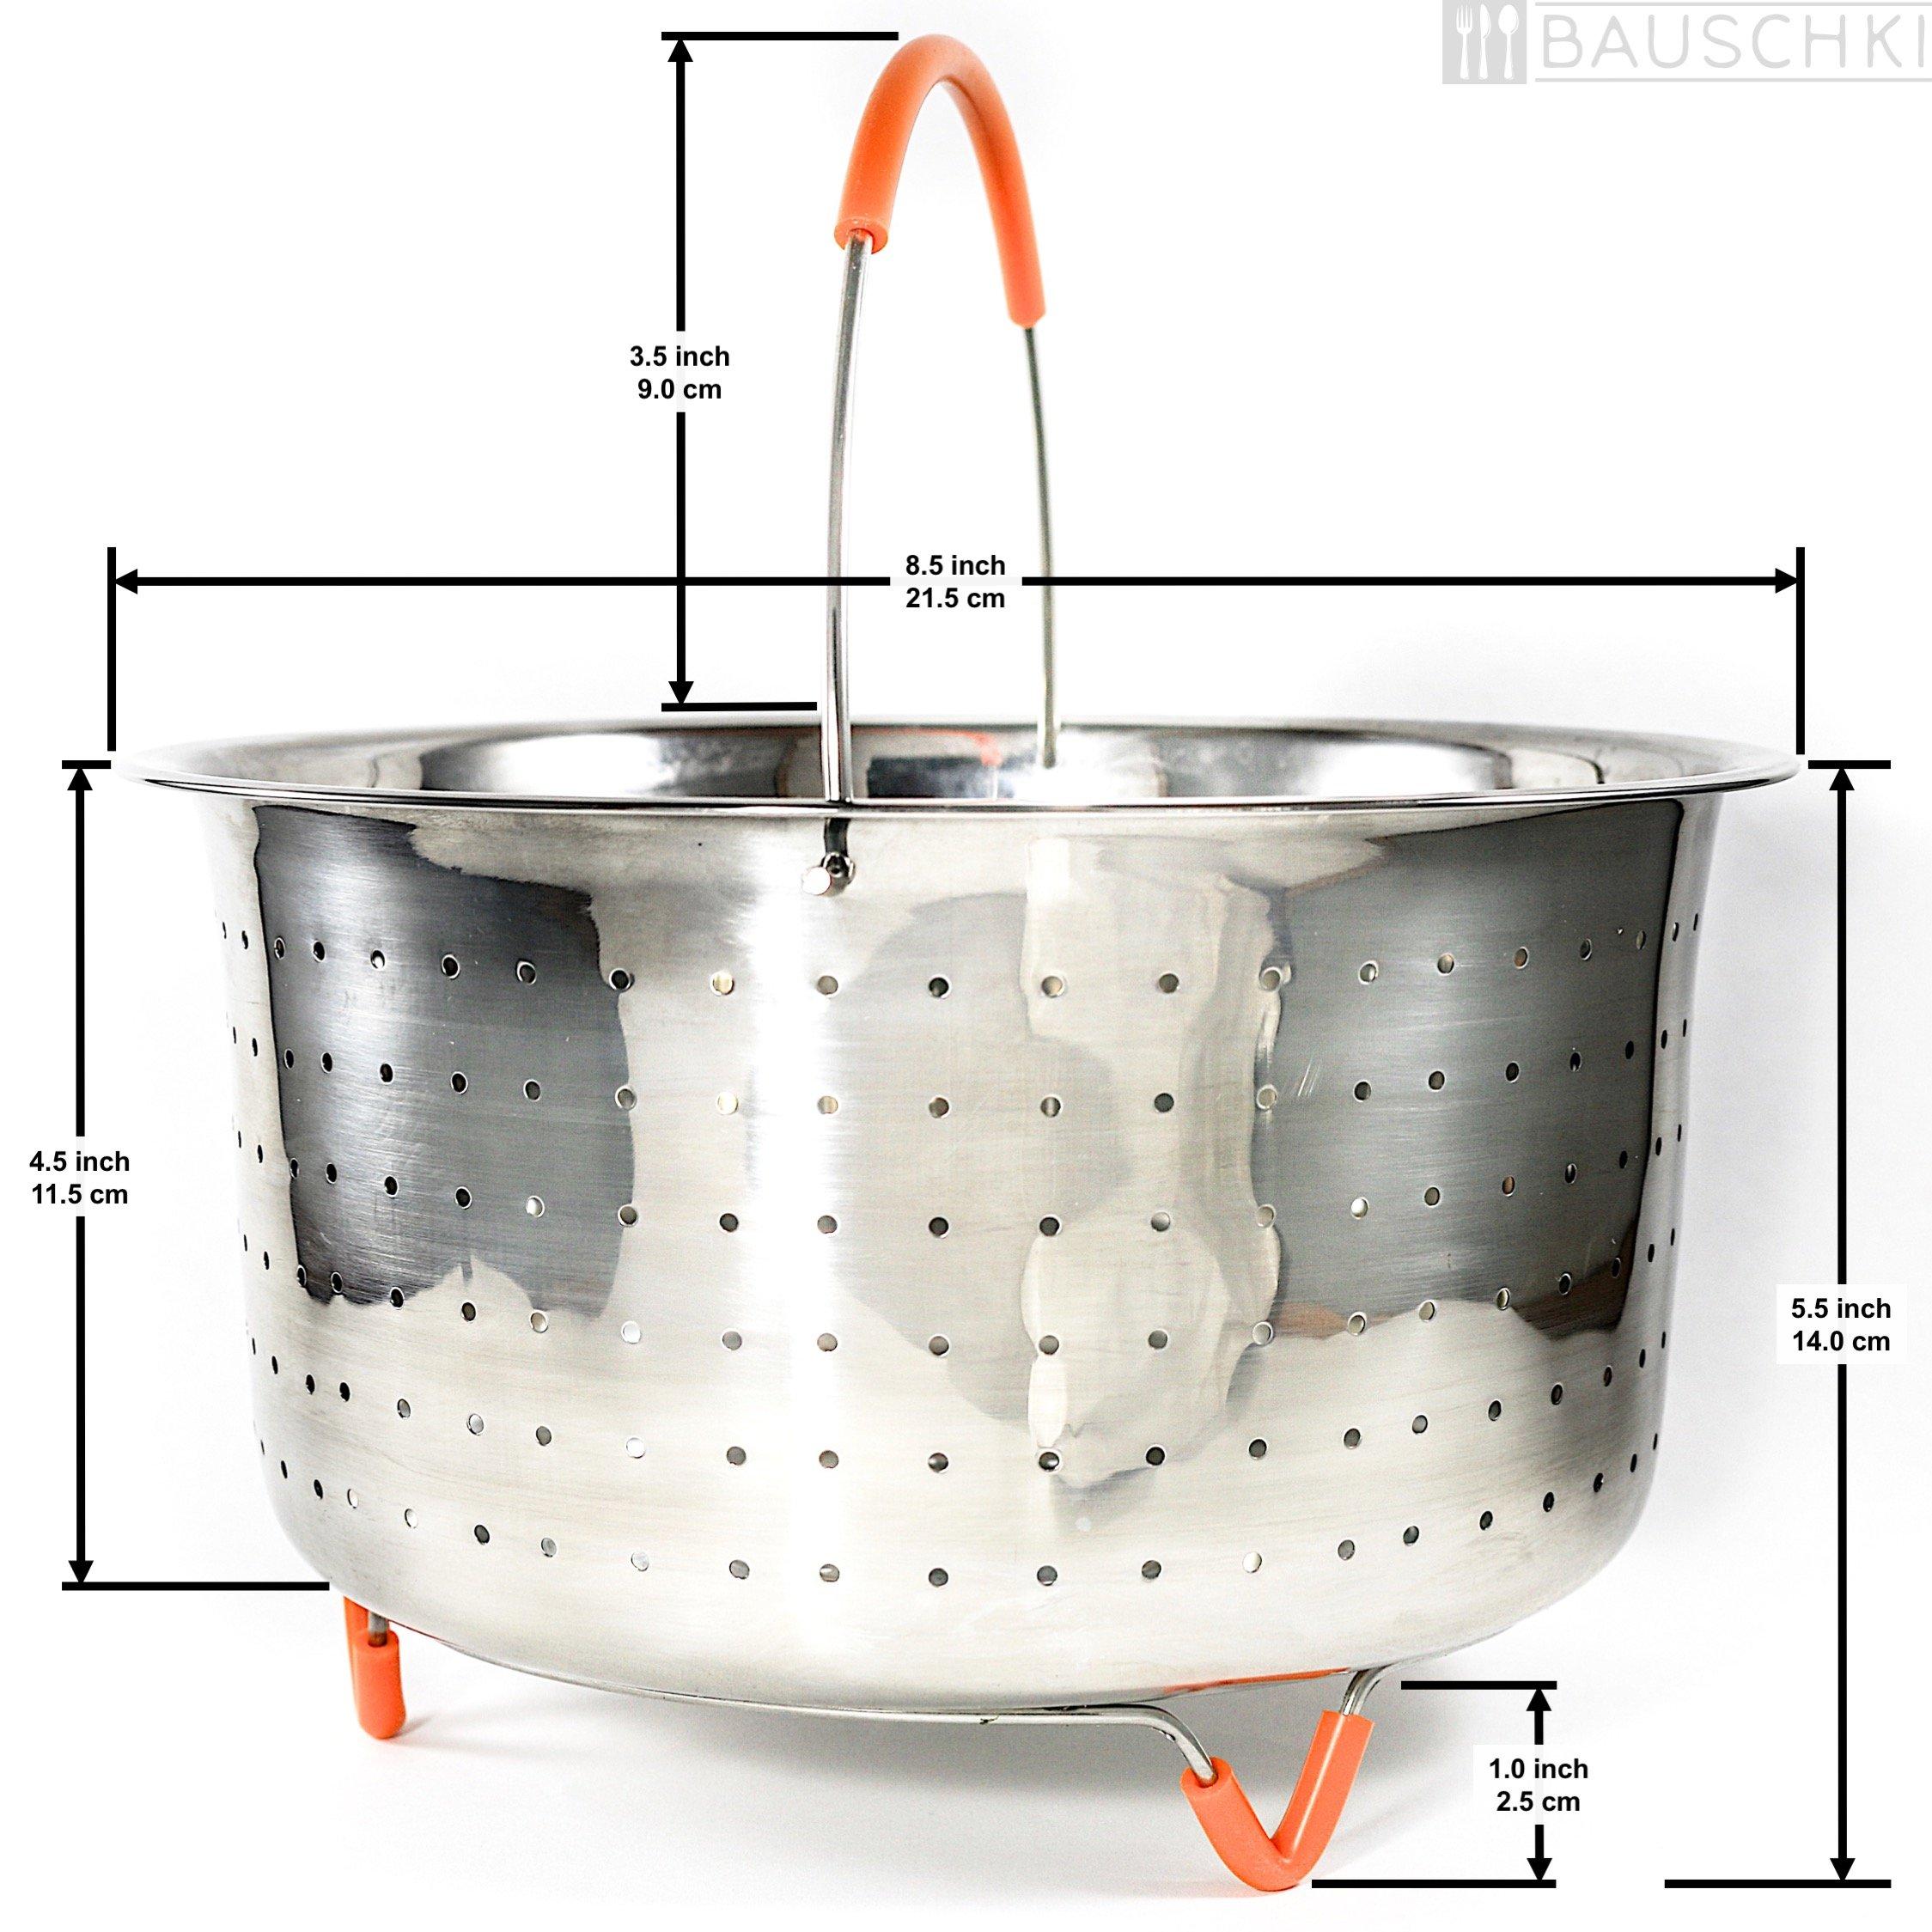 Bauschki Instant Pot Accessories, Vegetable Steamer Basket for instapot 6qt, 8qt - Egg Meat Food Rice Dumpling Cooker 6 qt, 8 quart Accessory - Stainless Steel, BPA Free Non-Slip Silicone Handle &Legs by Bauschki (Image #2)